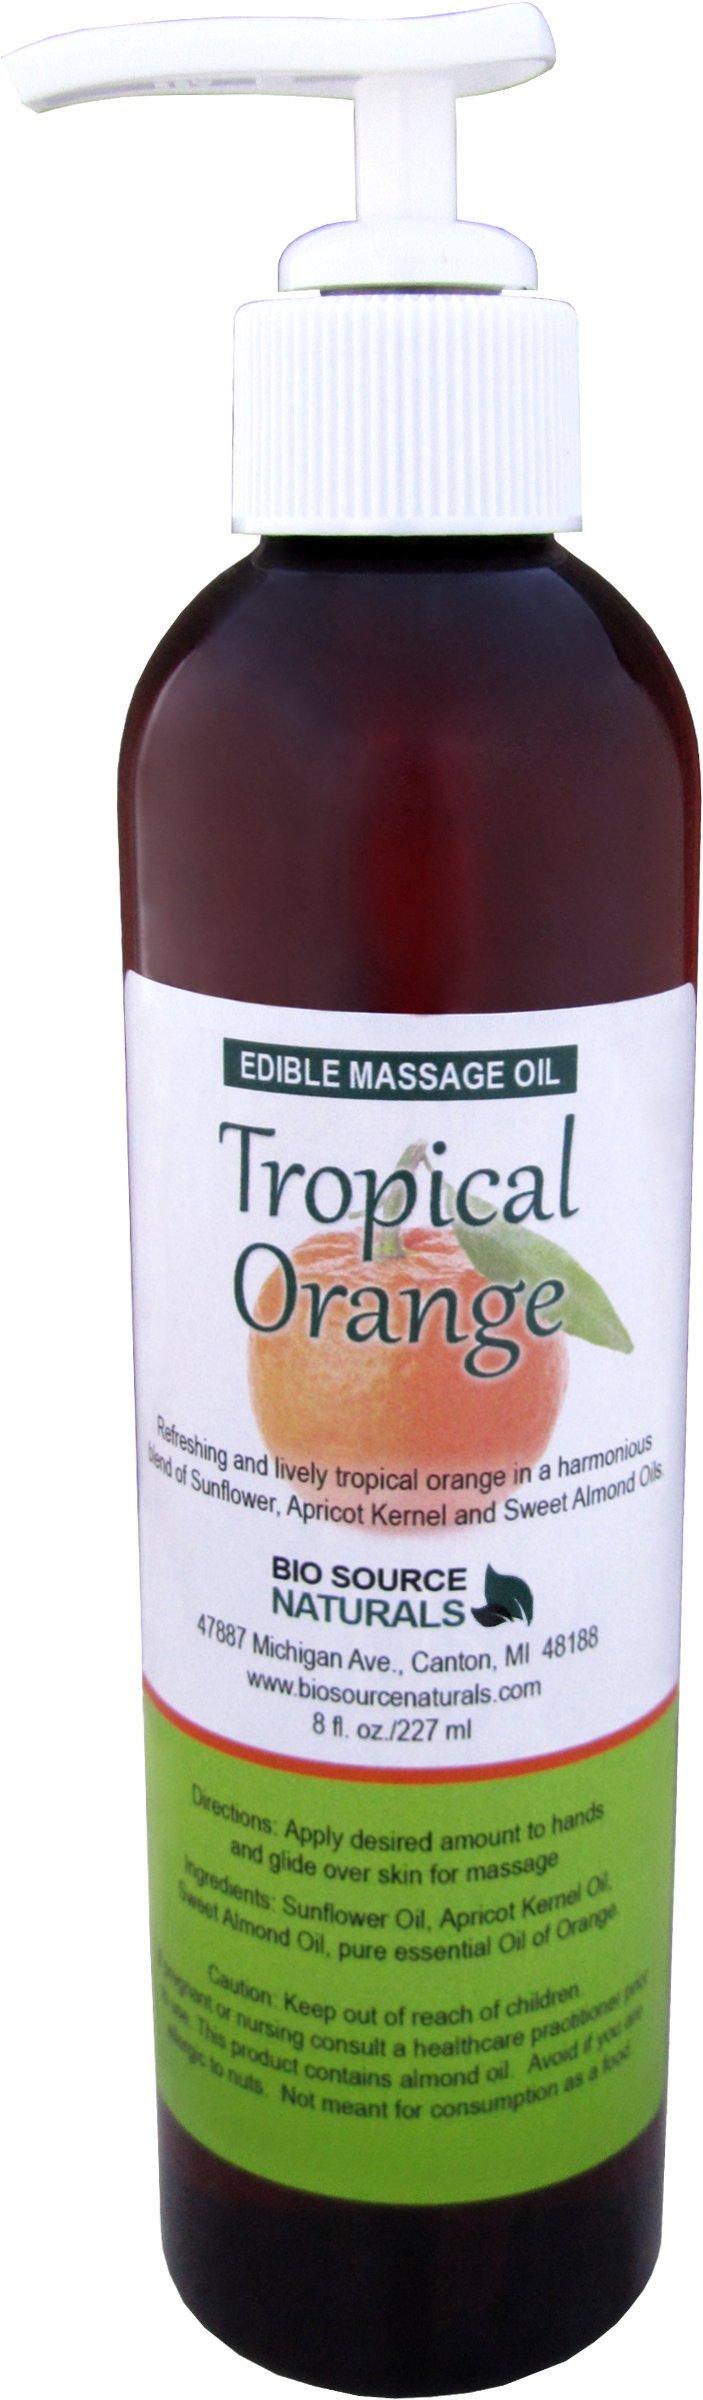 Tropical Orange Edible, Kissable Massage Oil 8 fl. oz. Pump with Pure Orange Essential Oil and all Natural Plant Oils